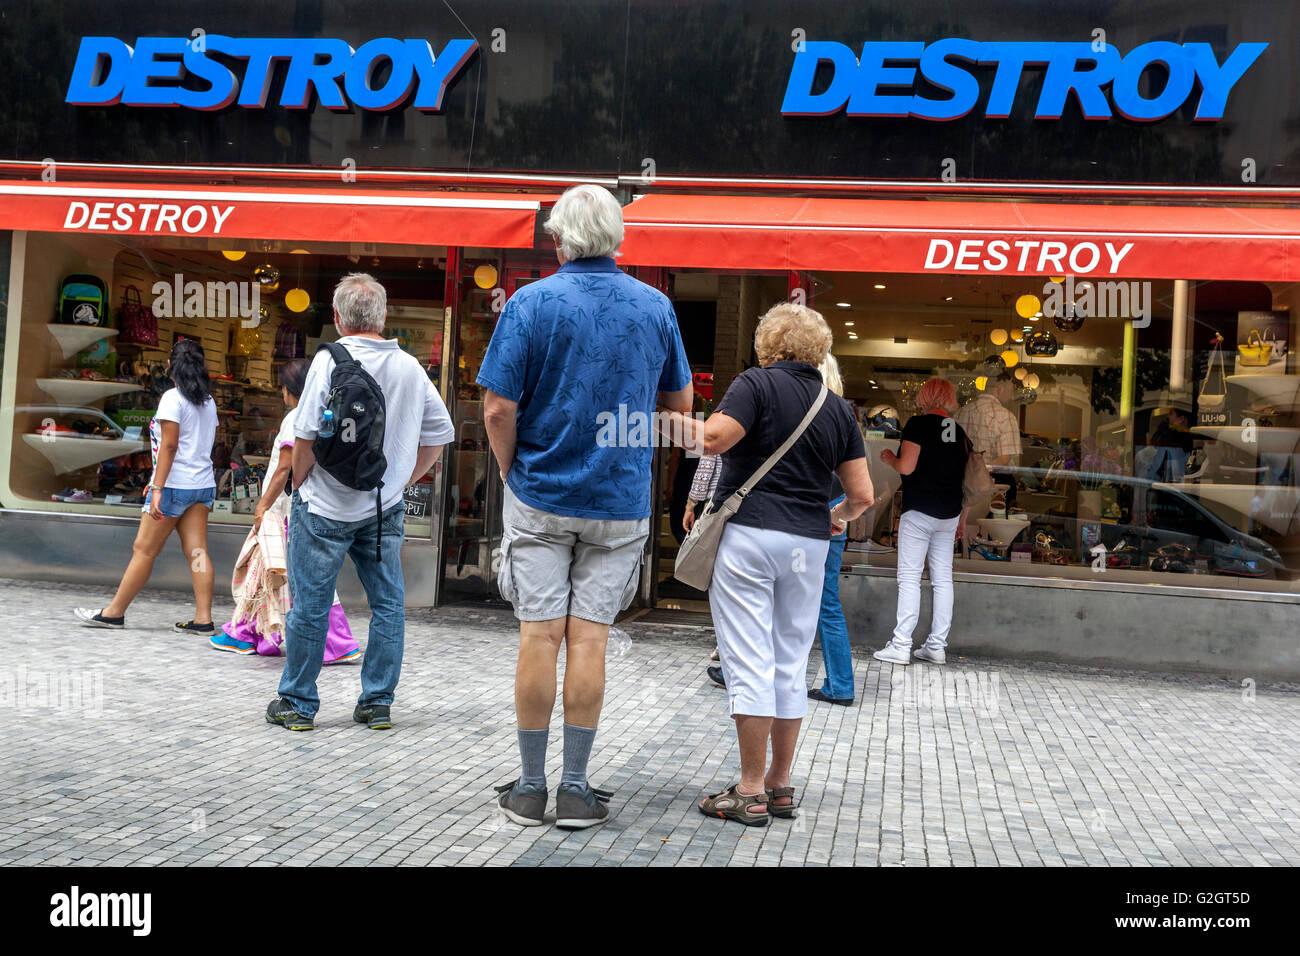 Destroy fashion store, Na Prikope street, Prague, Czech Republic - Stock Image